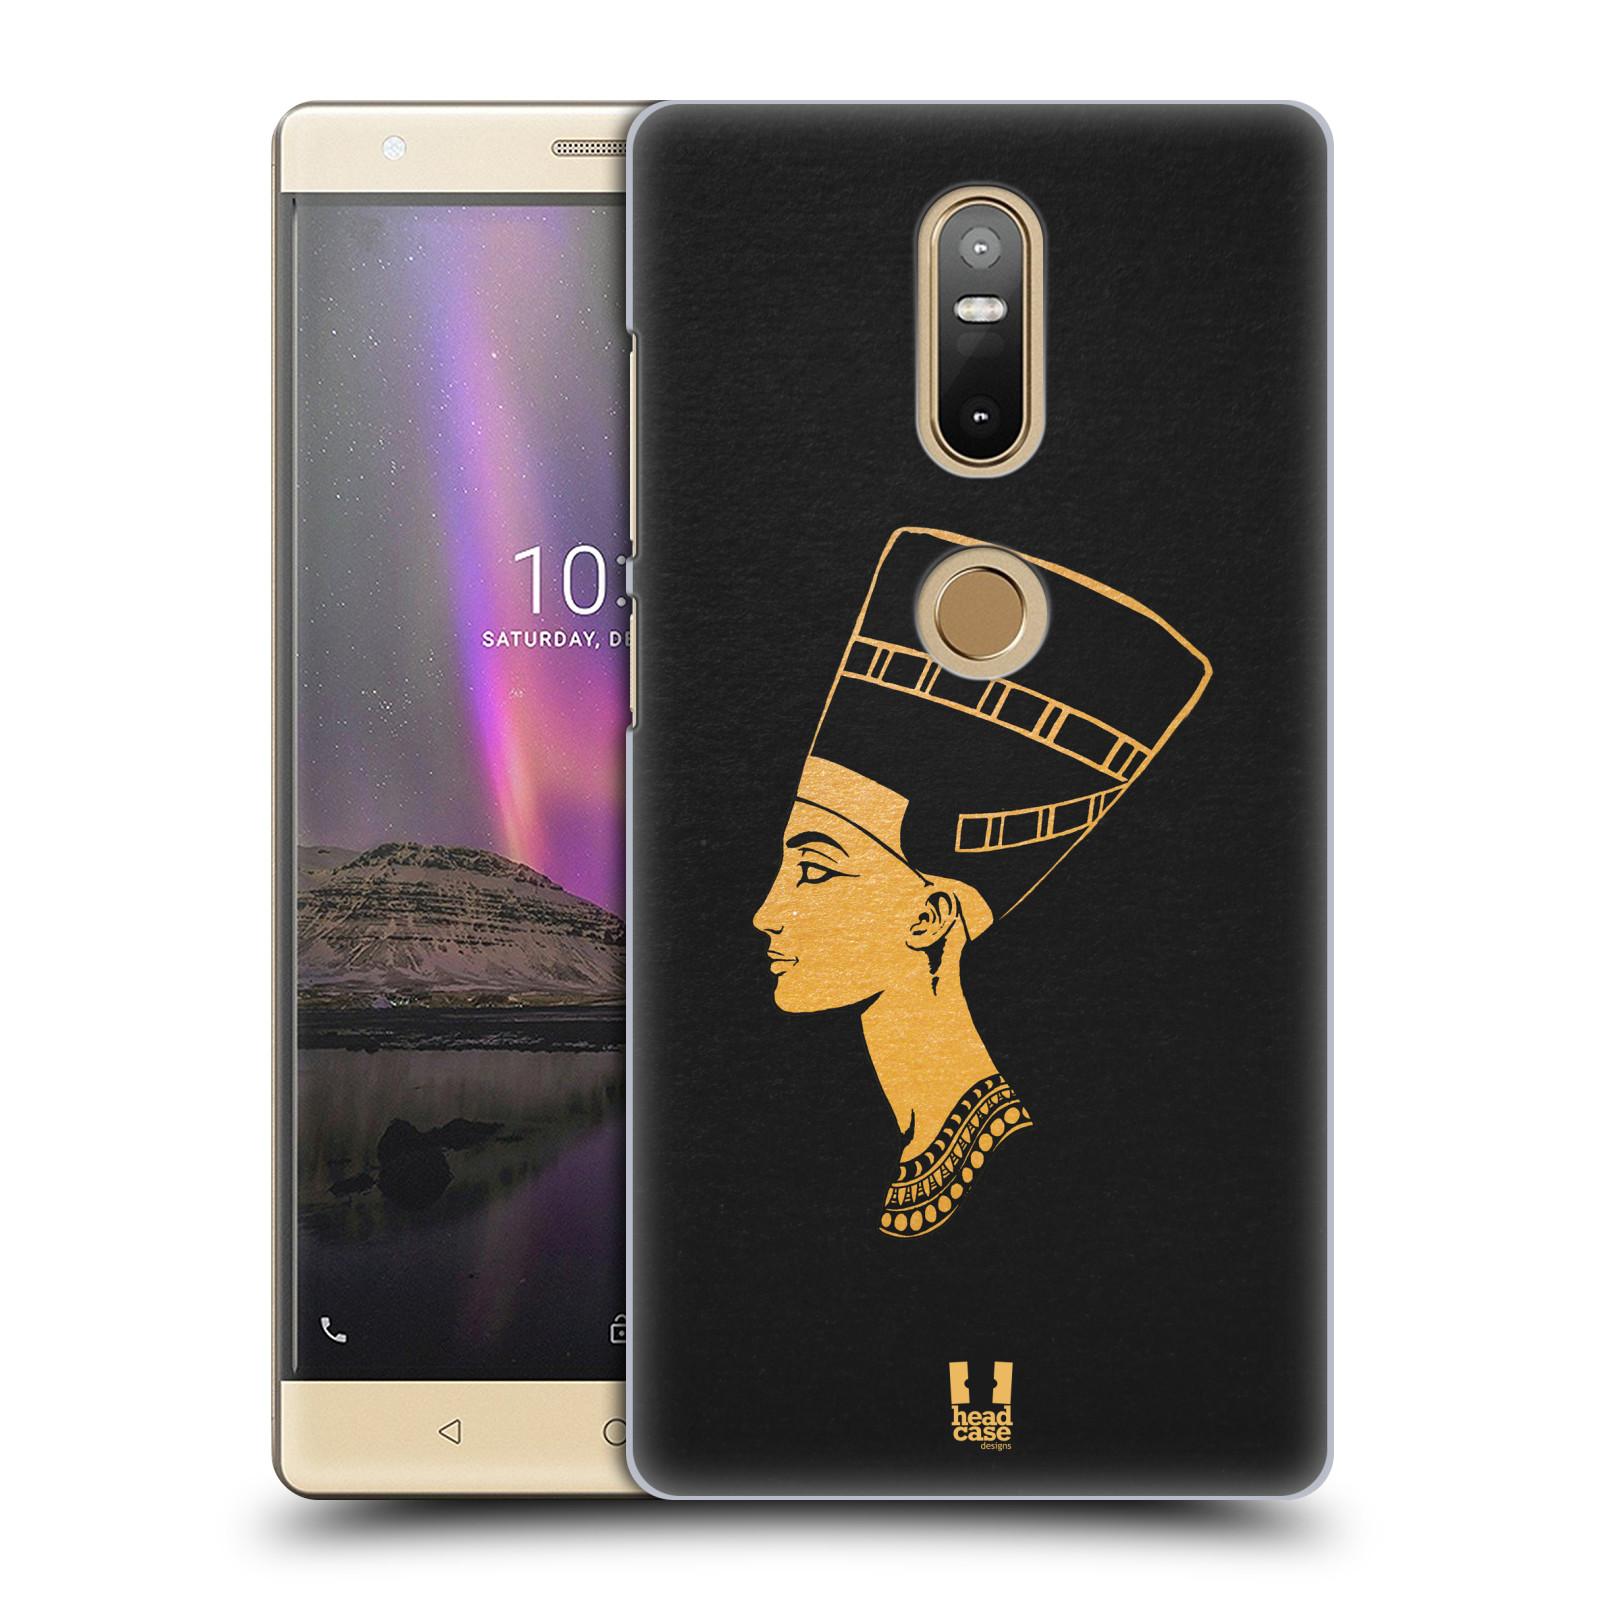 Plastové pouzdro na mobil Lenovo Phab 2 Plus - Head Case - EGYPT NEFERTITI (Plastový kryt či obal na mobilní telefon Lenovo Phab 2 Plus Dual SIM s motivem EGYPT NEFERTITI)